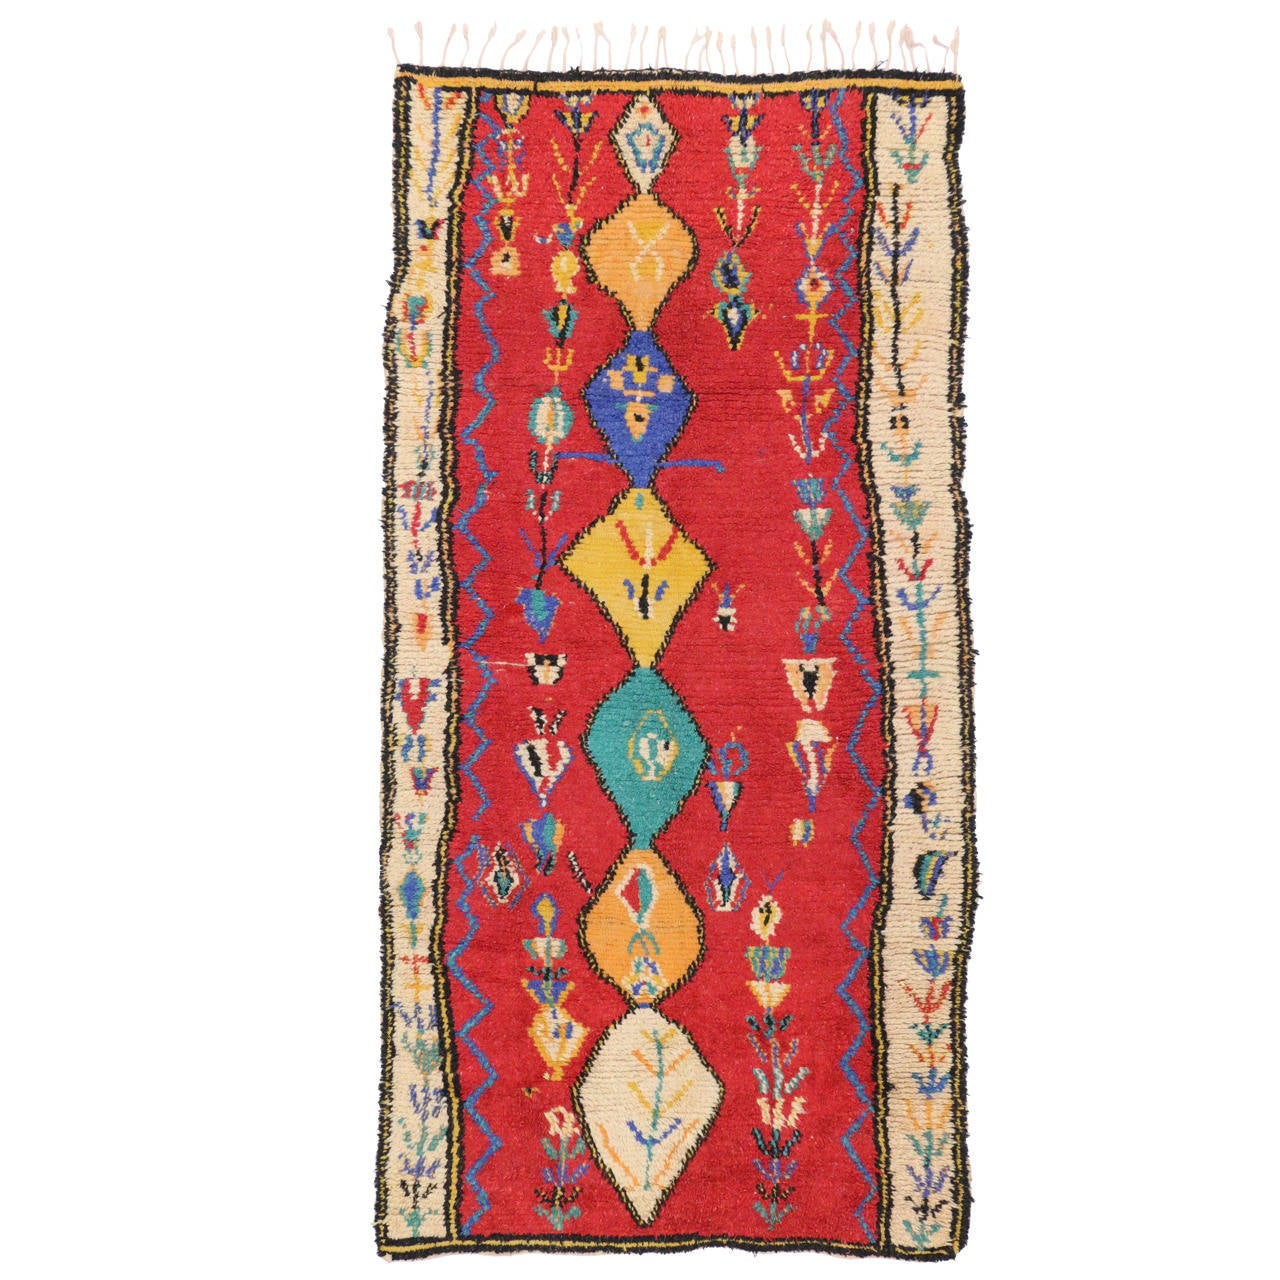 Vintage Berber Moroccan Red Rug With Modern Tribal Design For